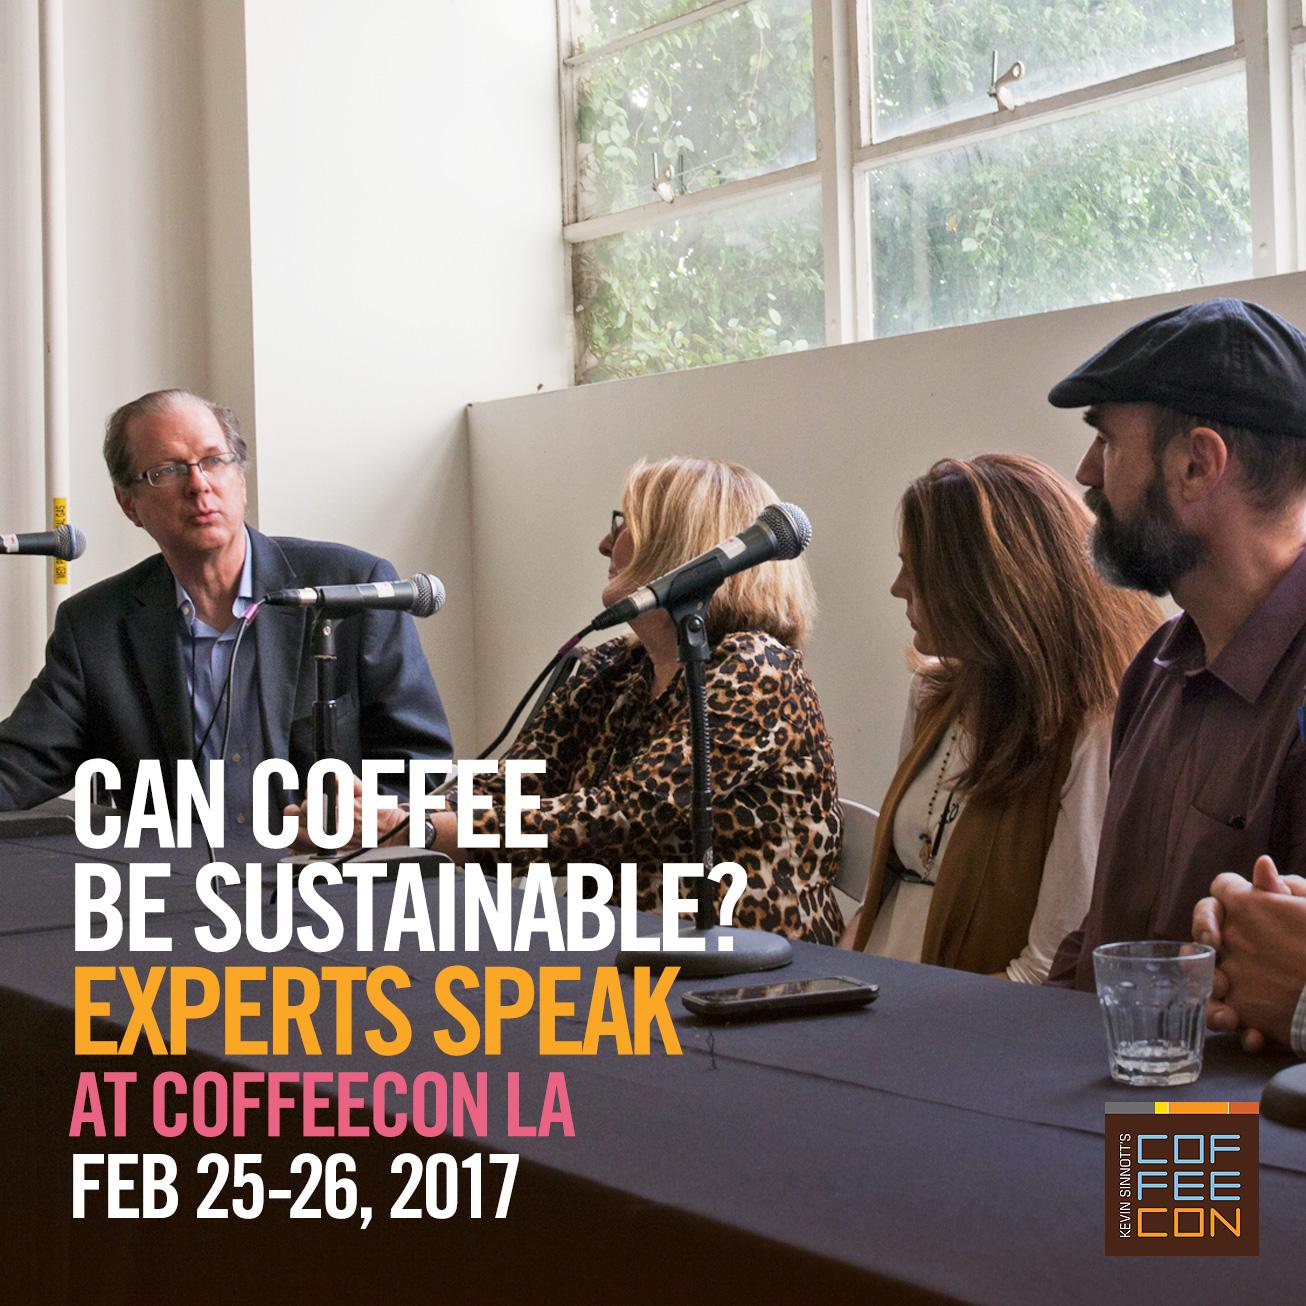 Coffee Sustainability at CoffeeConLA